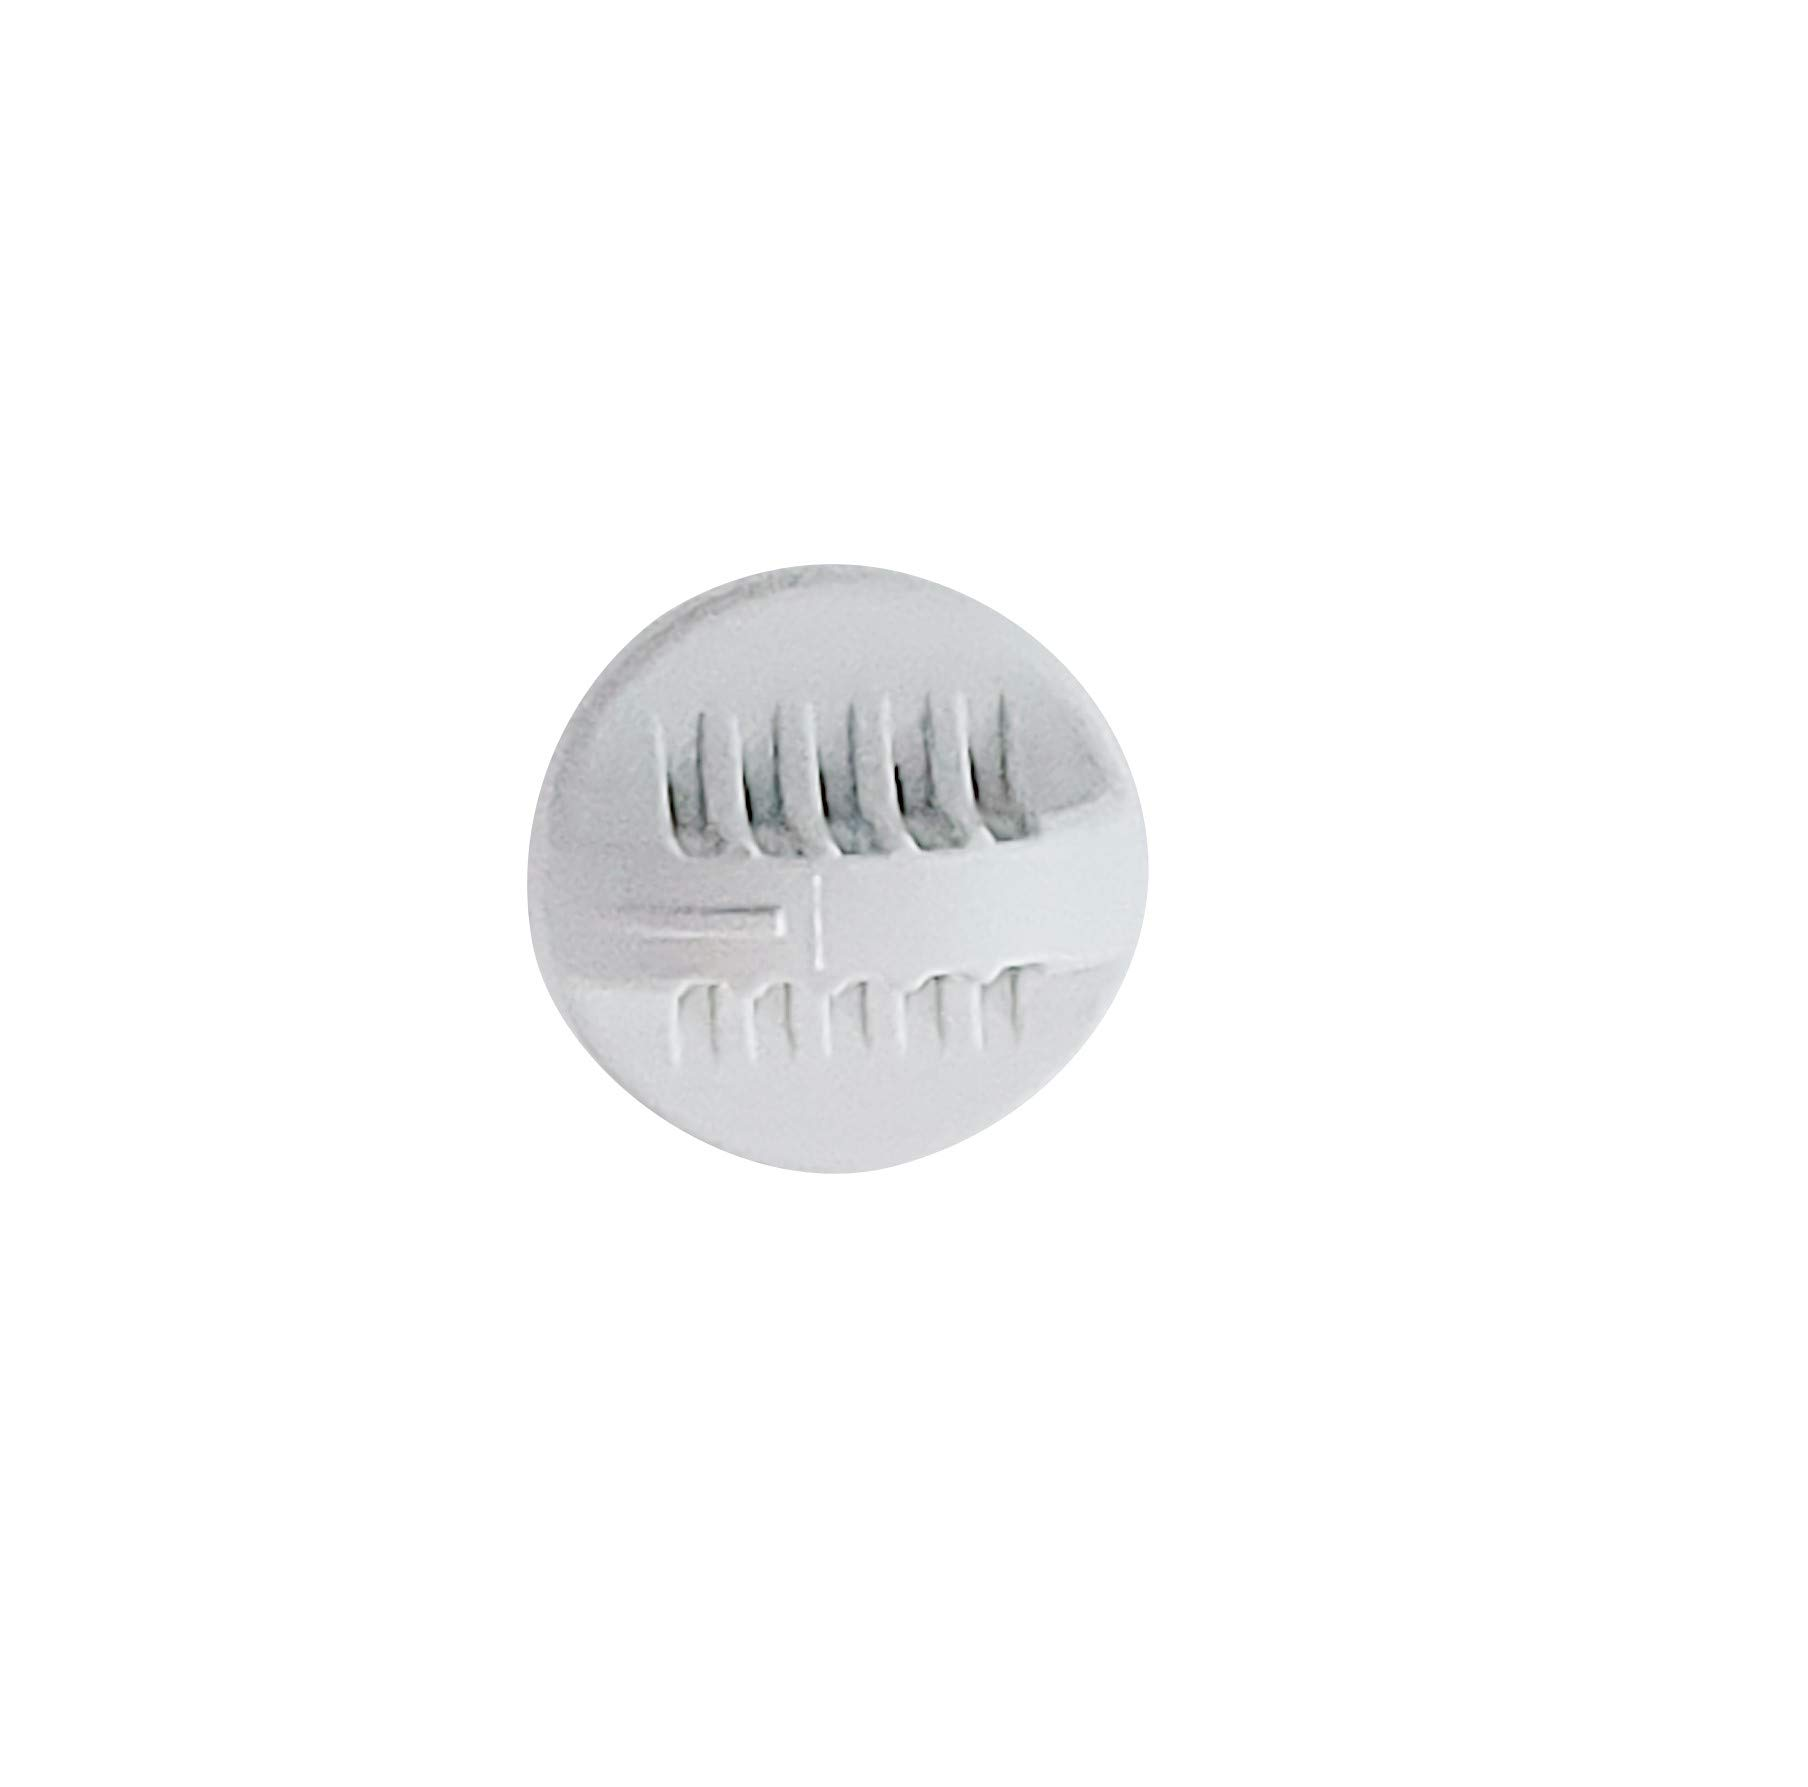 Just4Repair Air Conditioner Control Knob with